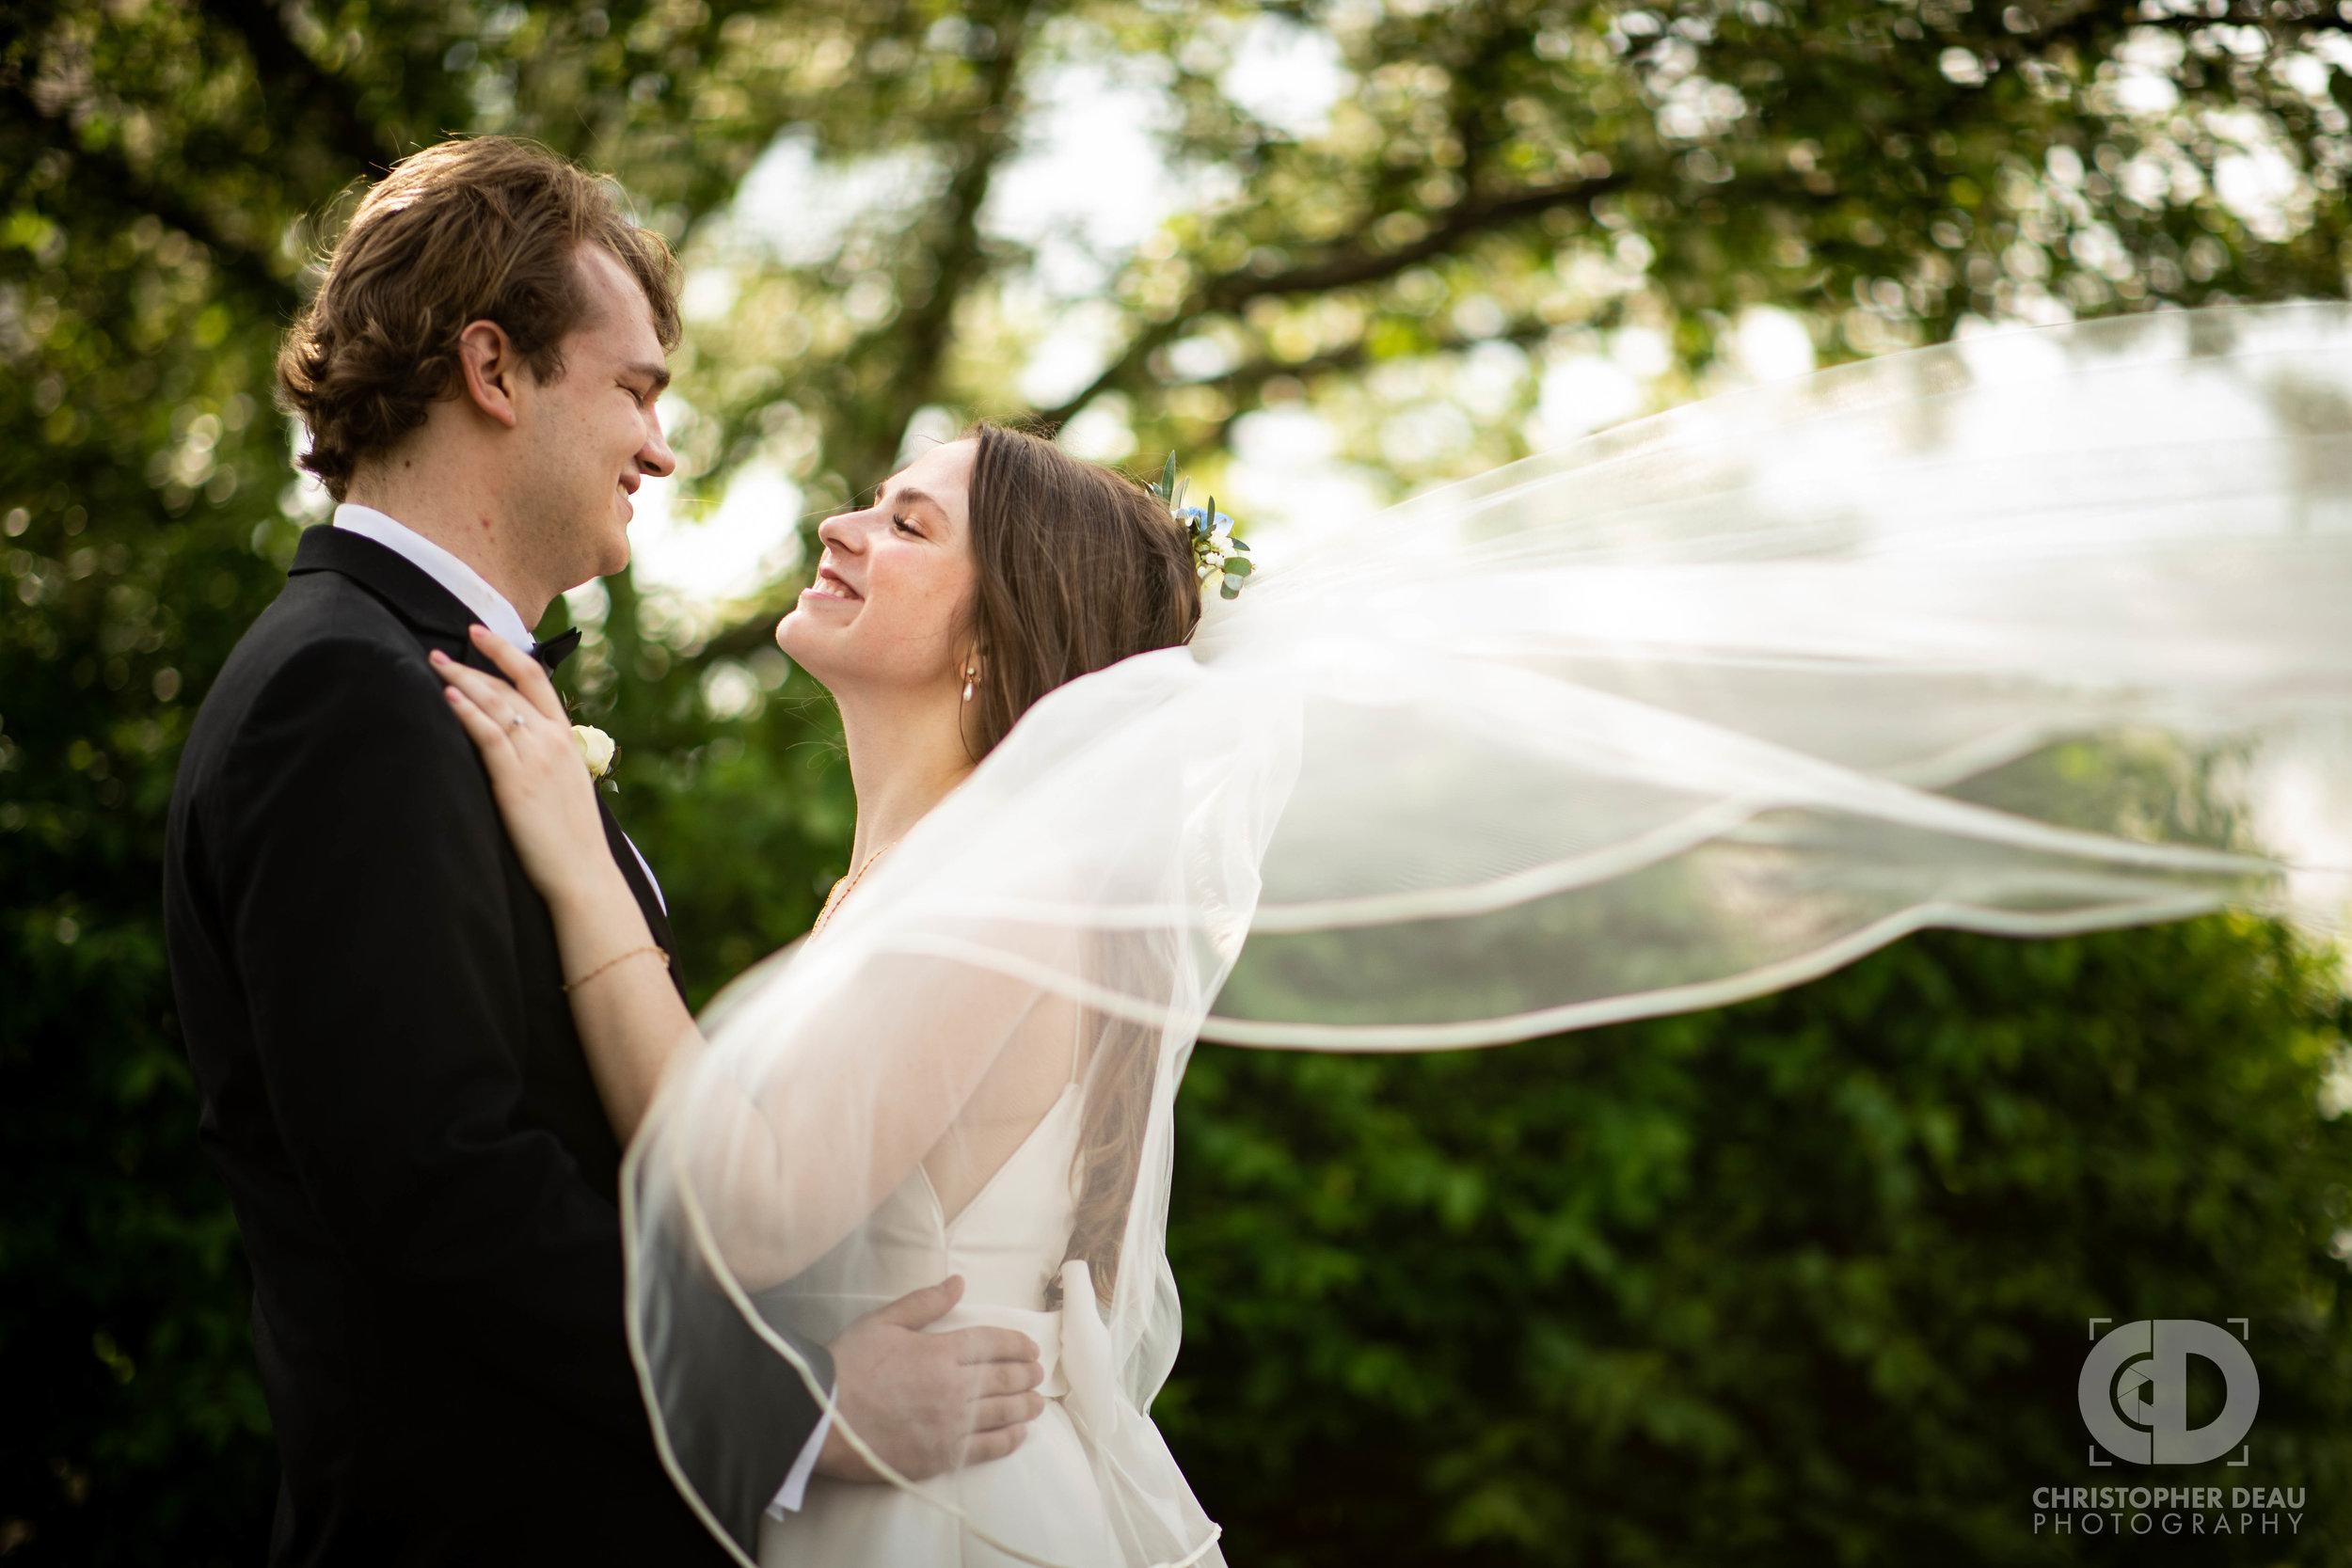 Flowing brides veil